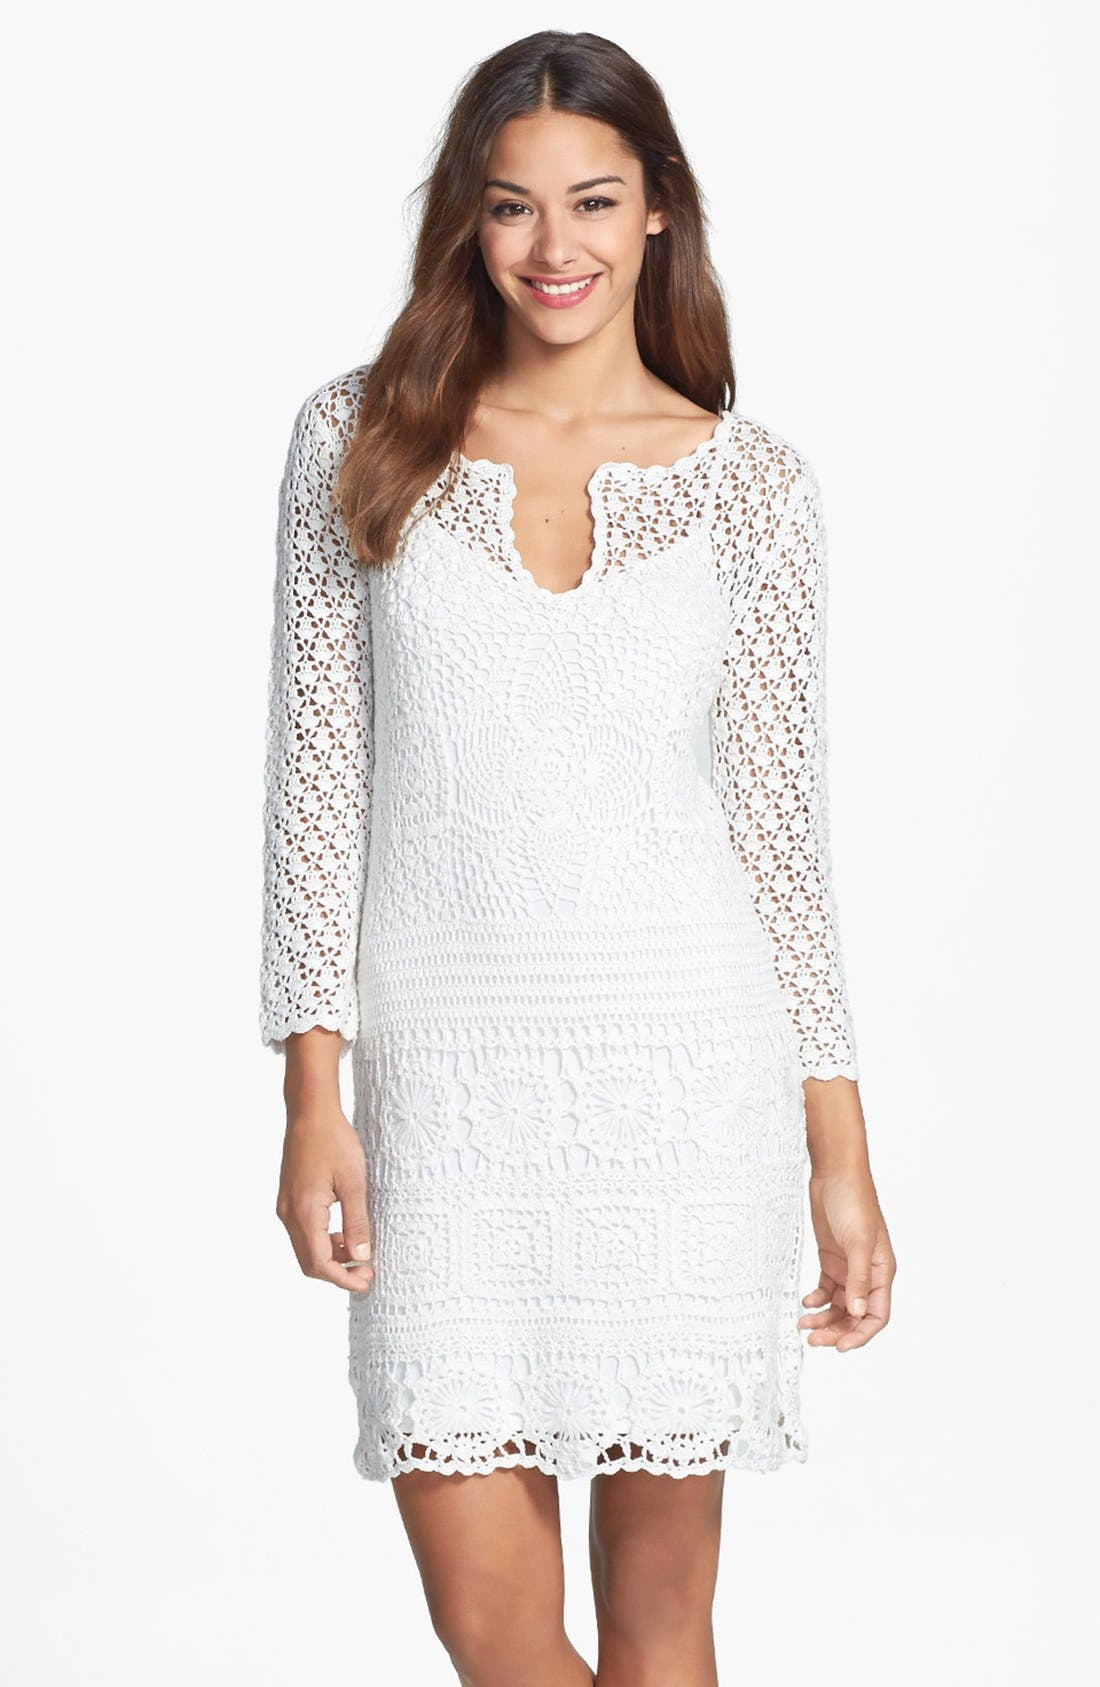 Alternate Image 1 Selected - Trina Turk 'Lanai' Crochet Lace Dress